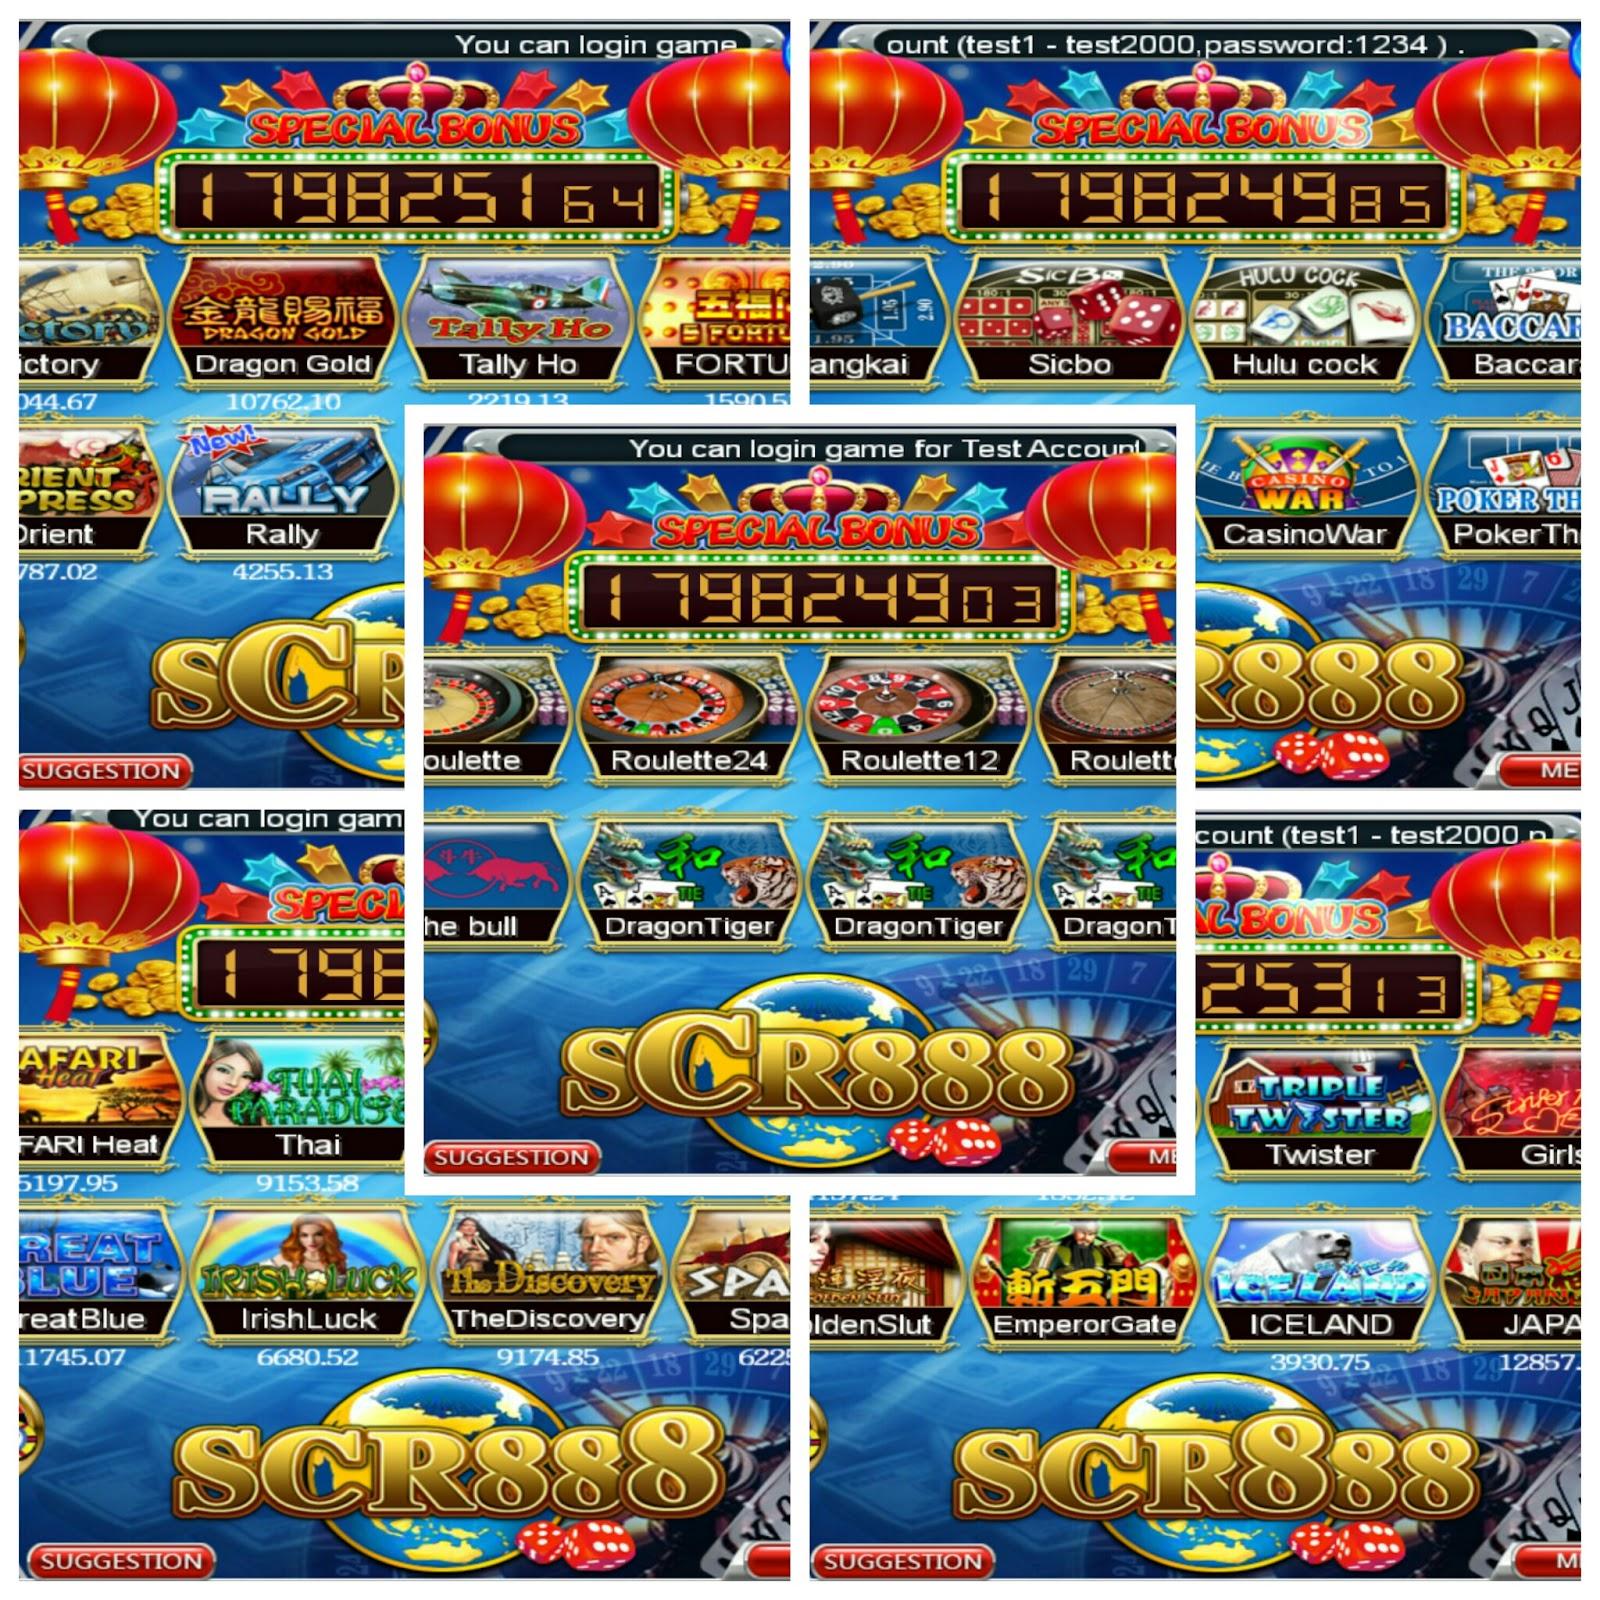 scr888 casino download laptop